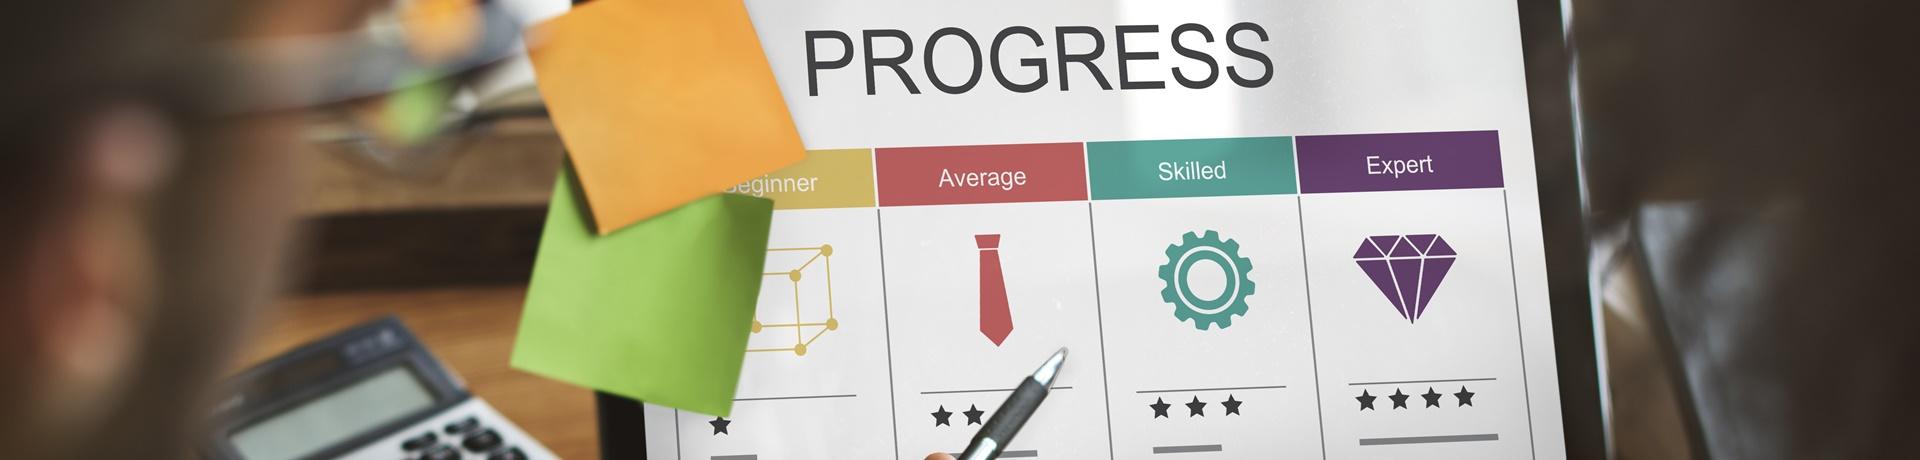 Career,Skills,Progress,Graphic,Icon,Symbol